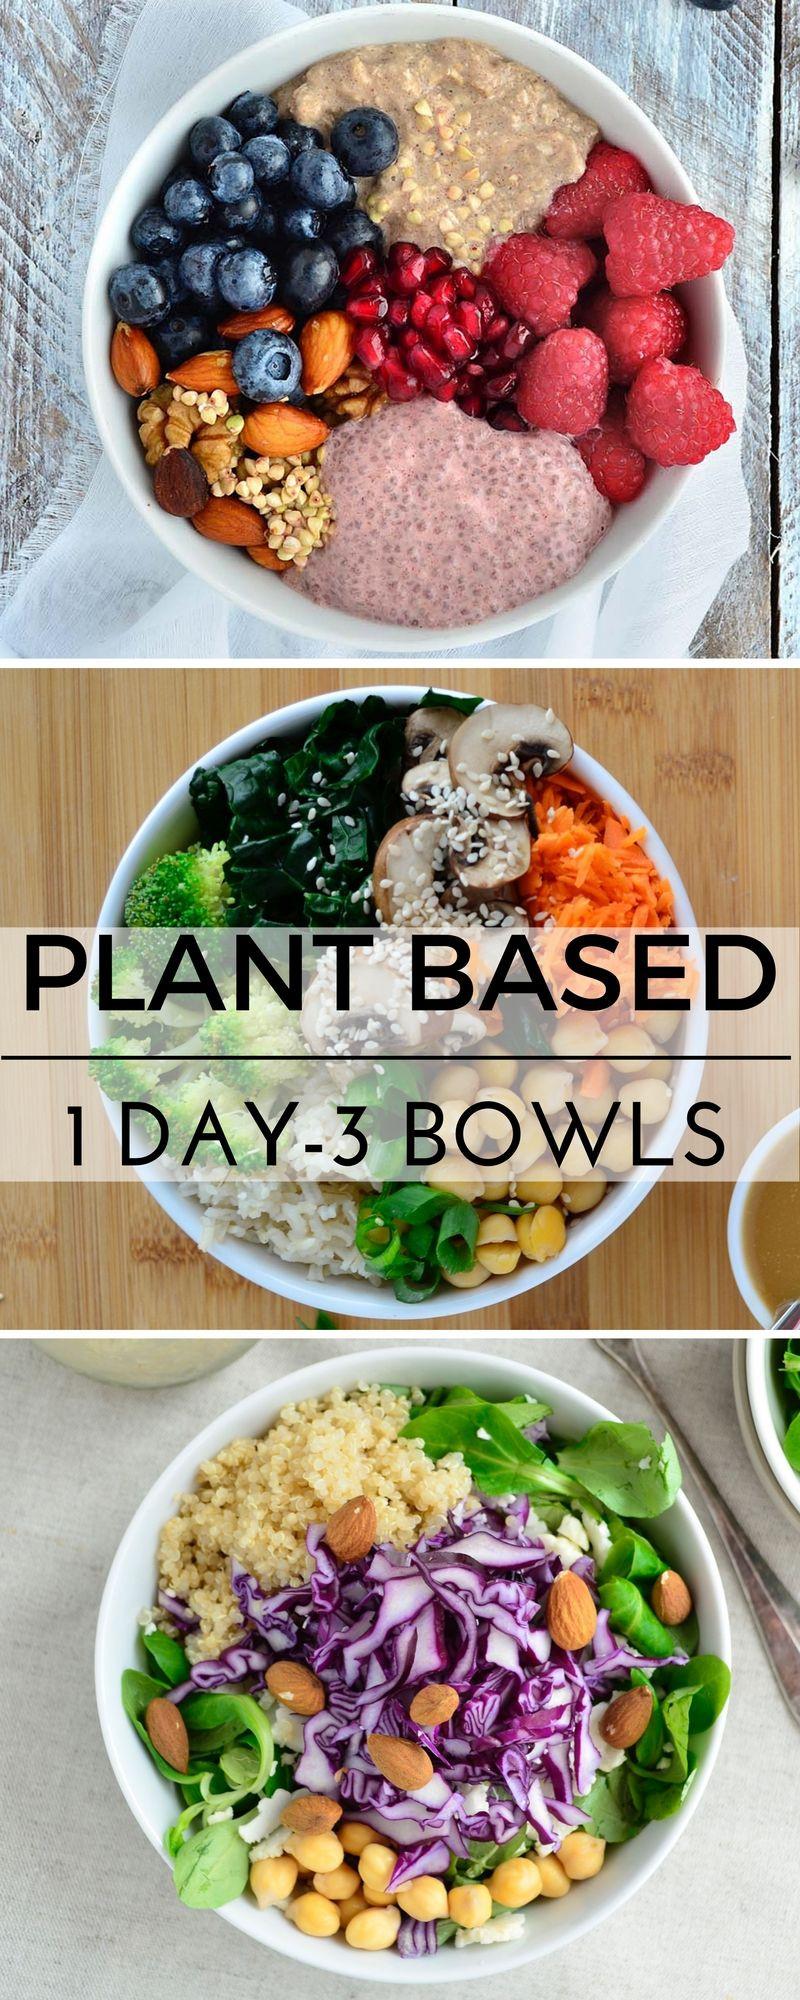 Vegan Plant Based Recipes  Plant based recipes vegan recipes healthy gluten free